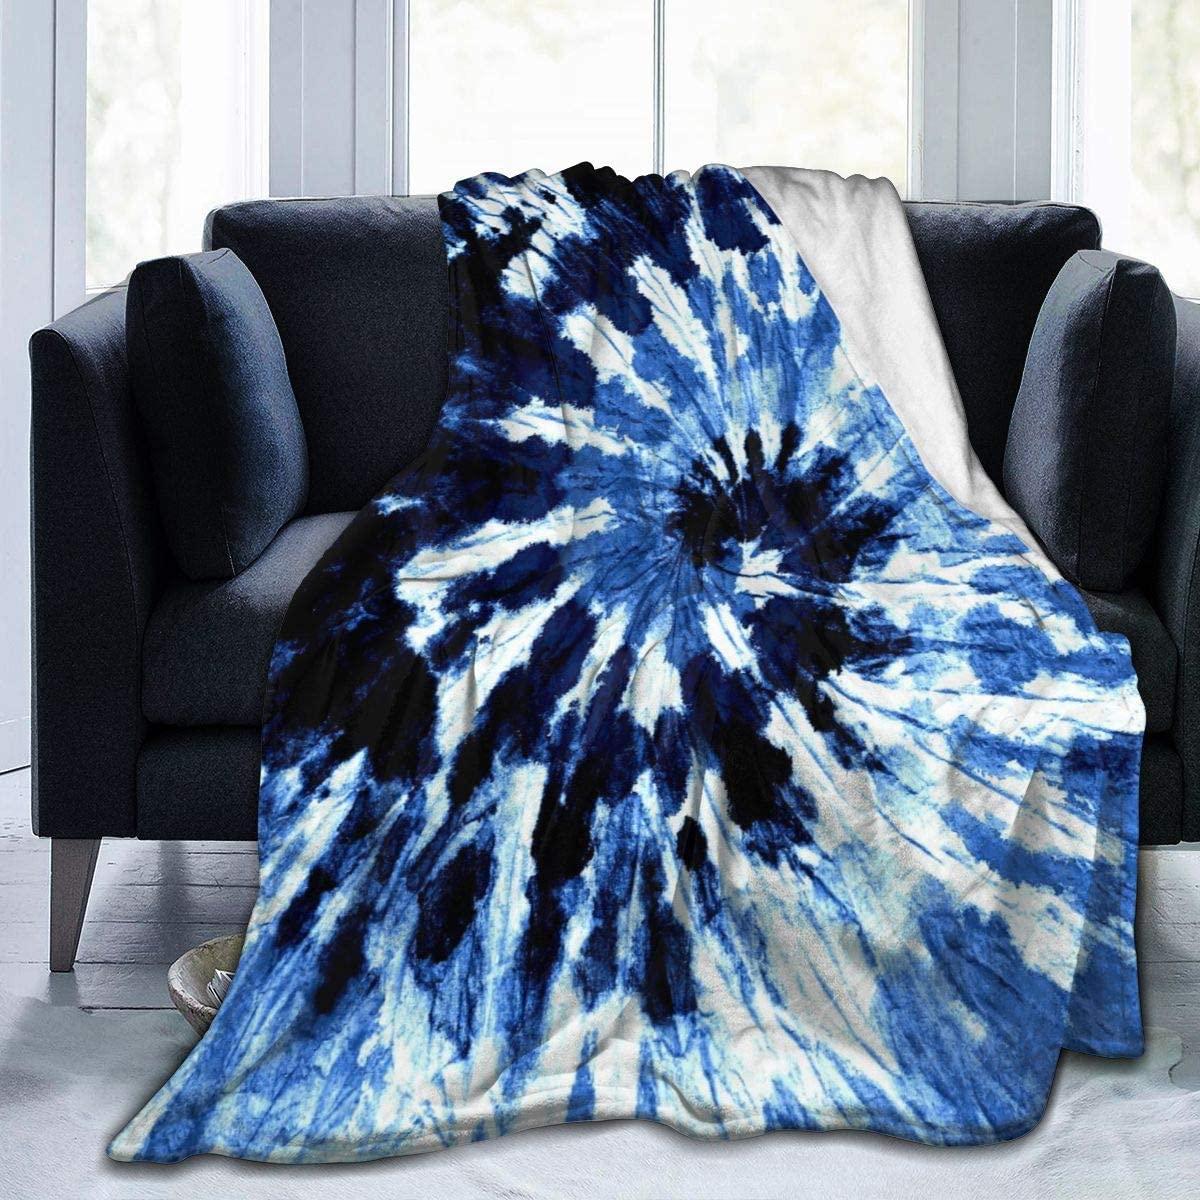 Delerain Tie-Dyed Soft Throw Blanket 40